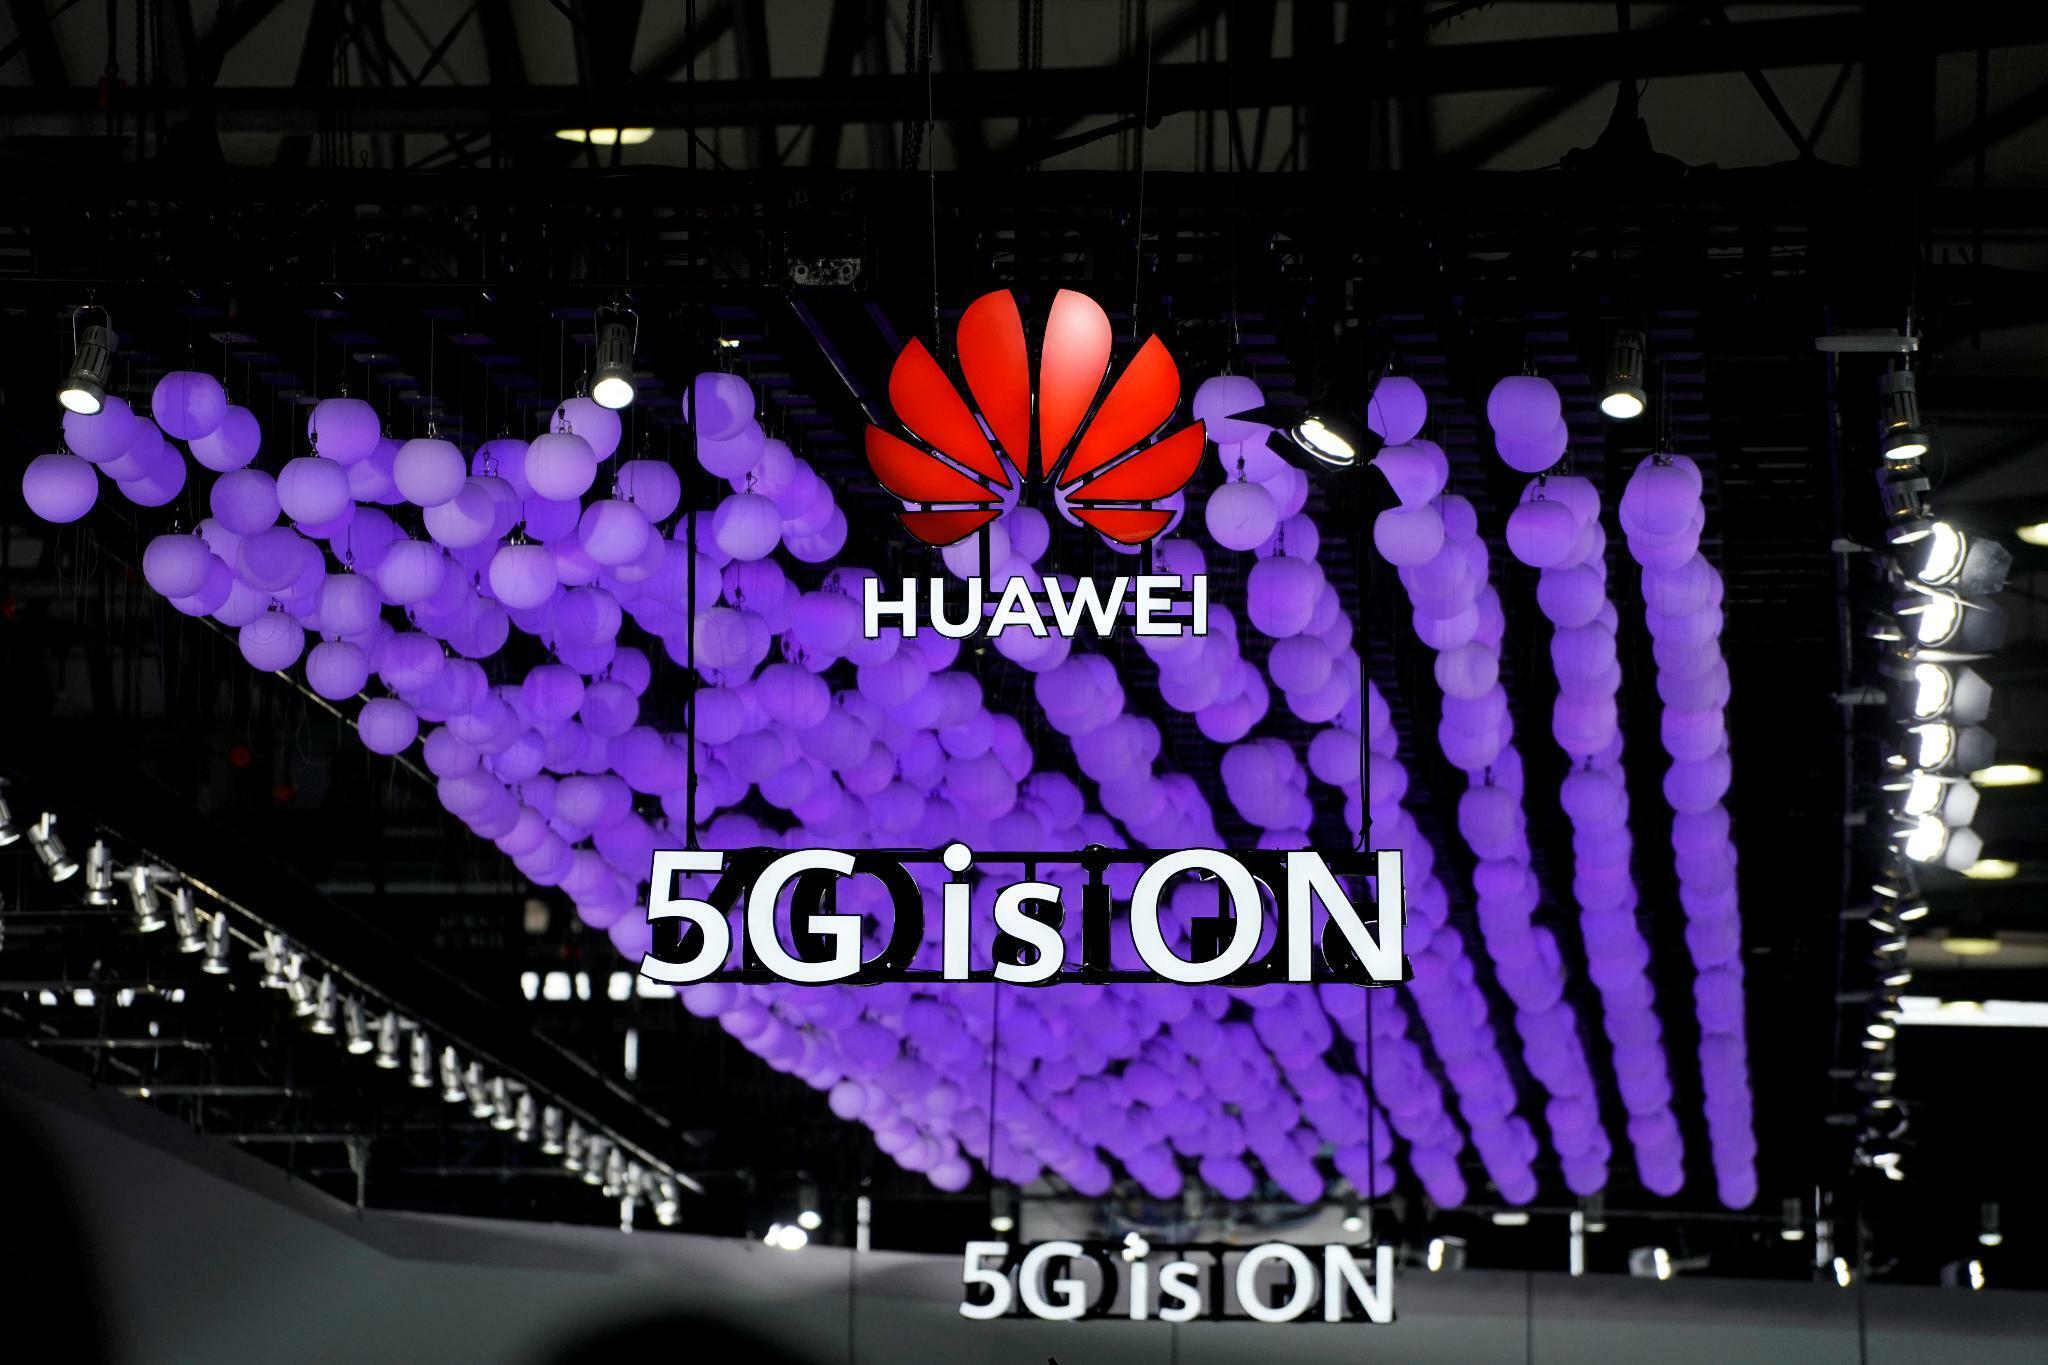 Grüne planen Anti-Huawei-Initiative im Bundestag